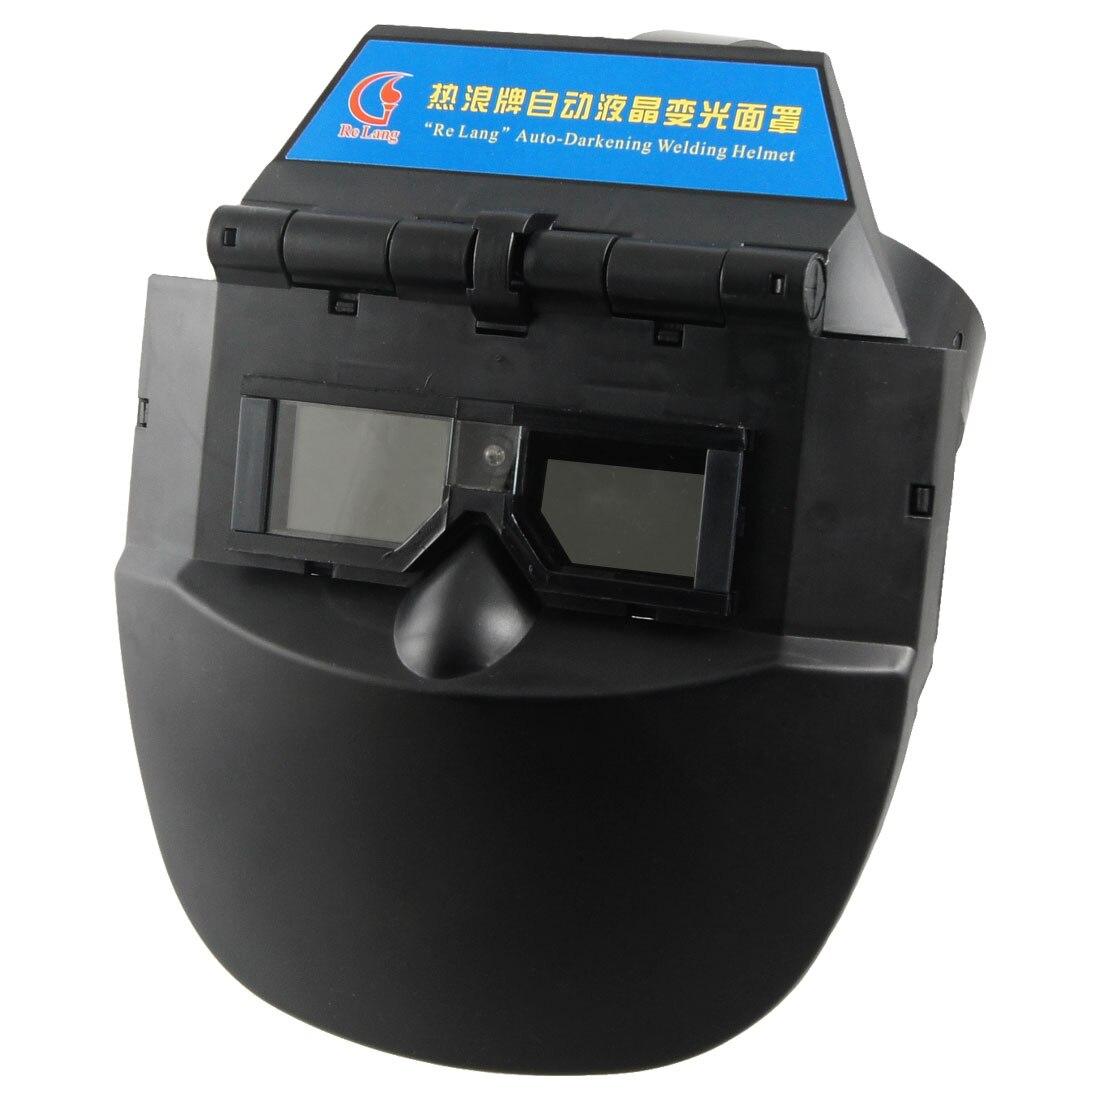 ФОТО UXCELL Black Plastic Auto Darkening Welding Helmet Mask Face Protector For